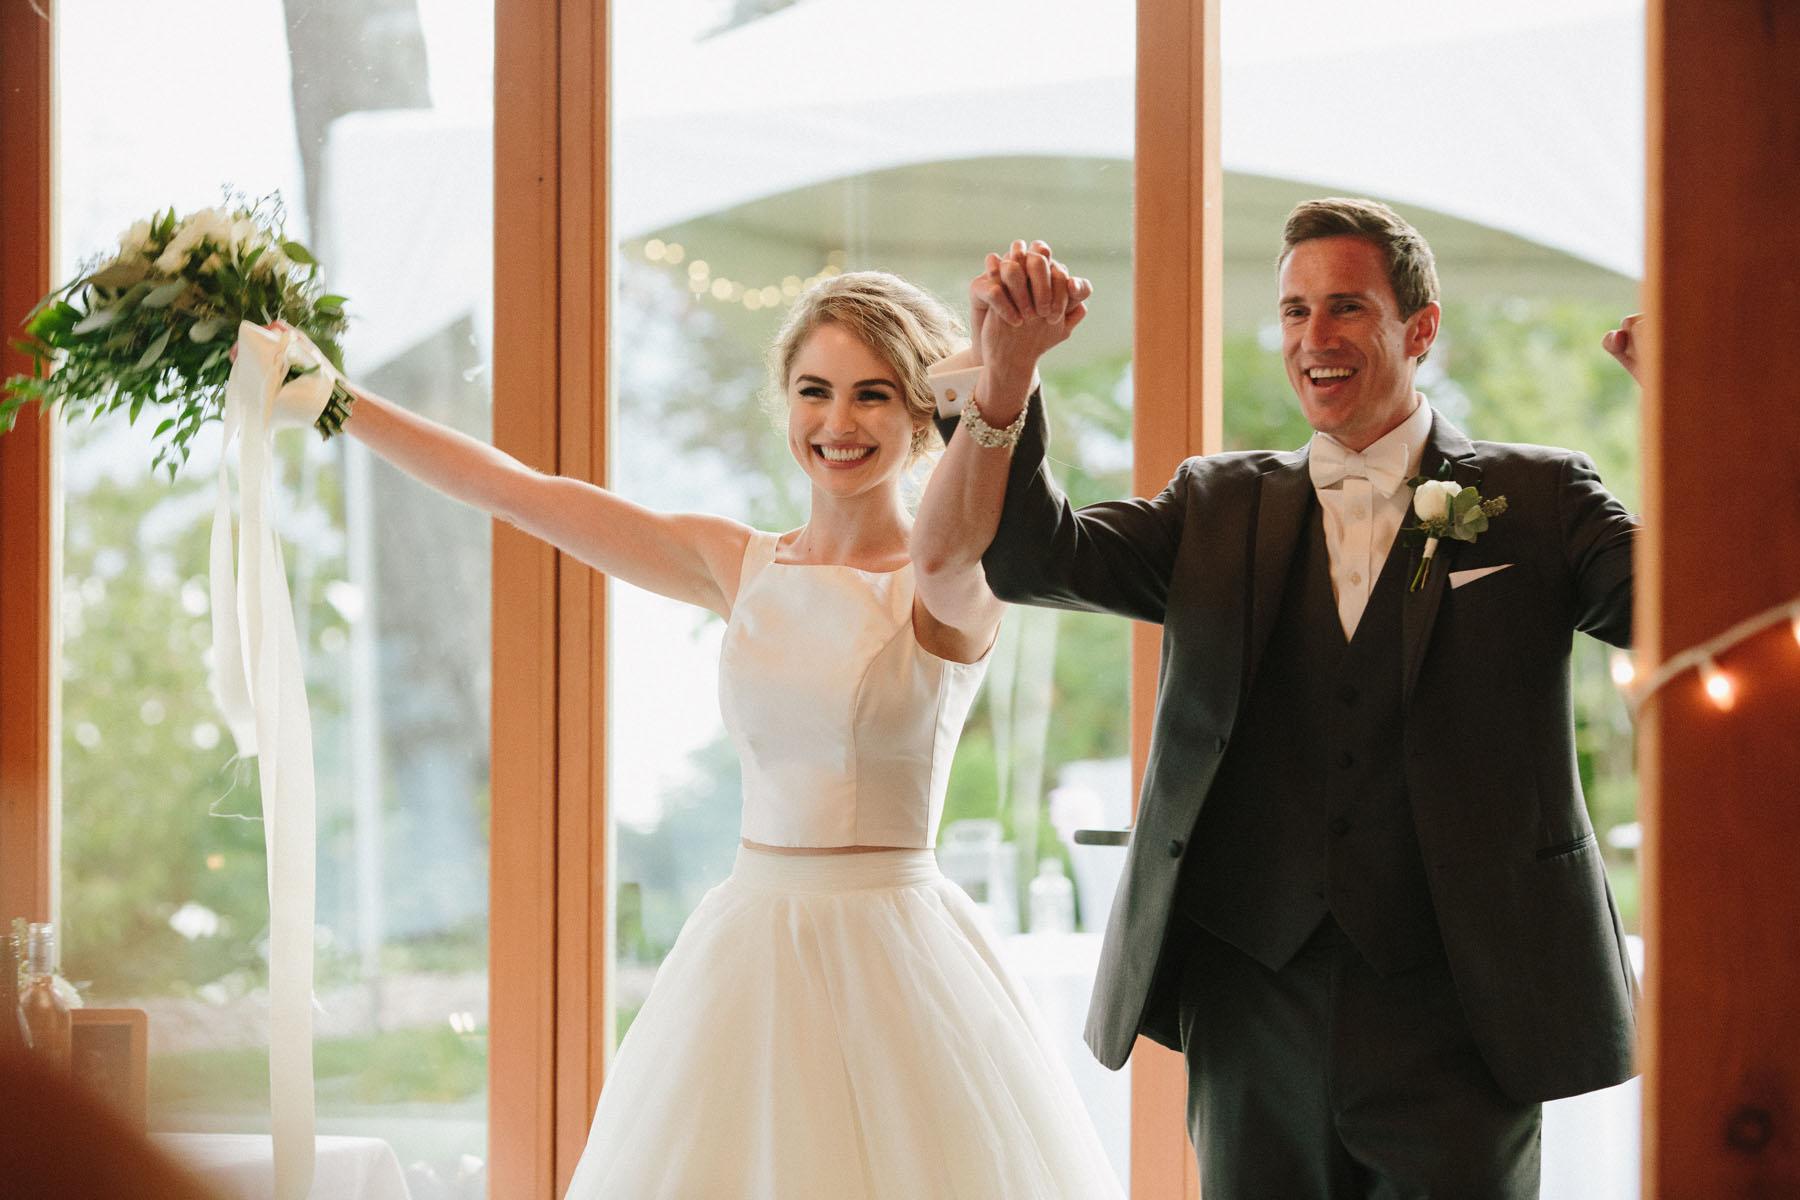 thetis-island-wedding-photographer-rp-rn-155.jpg